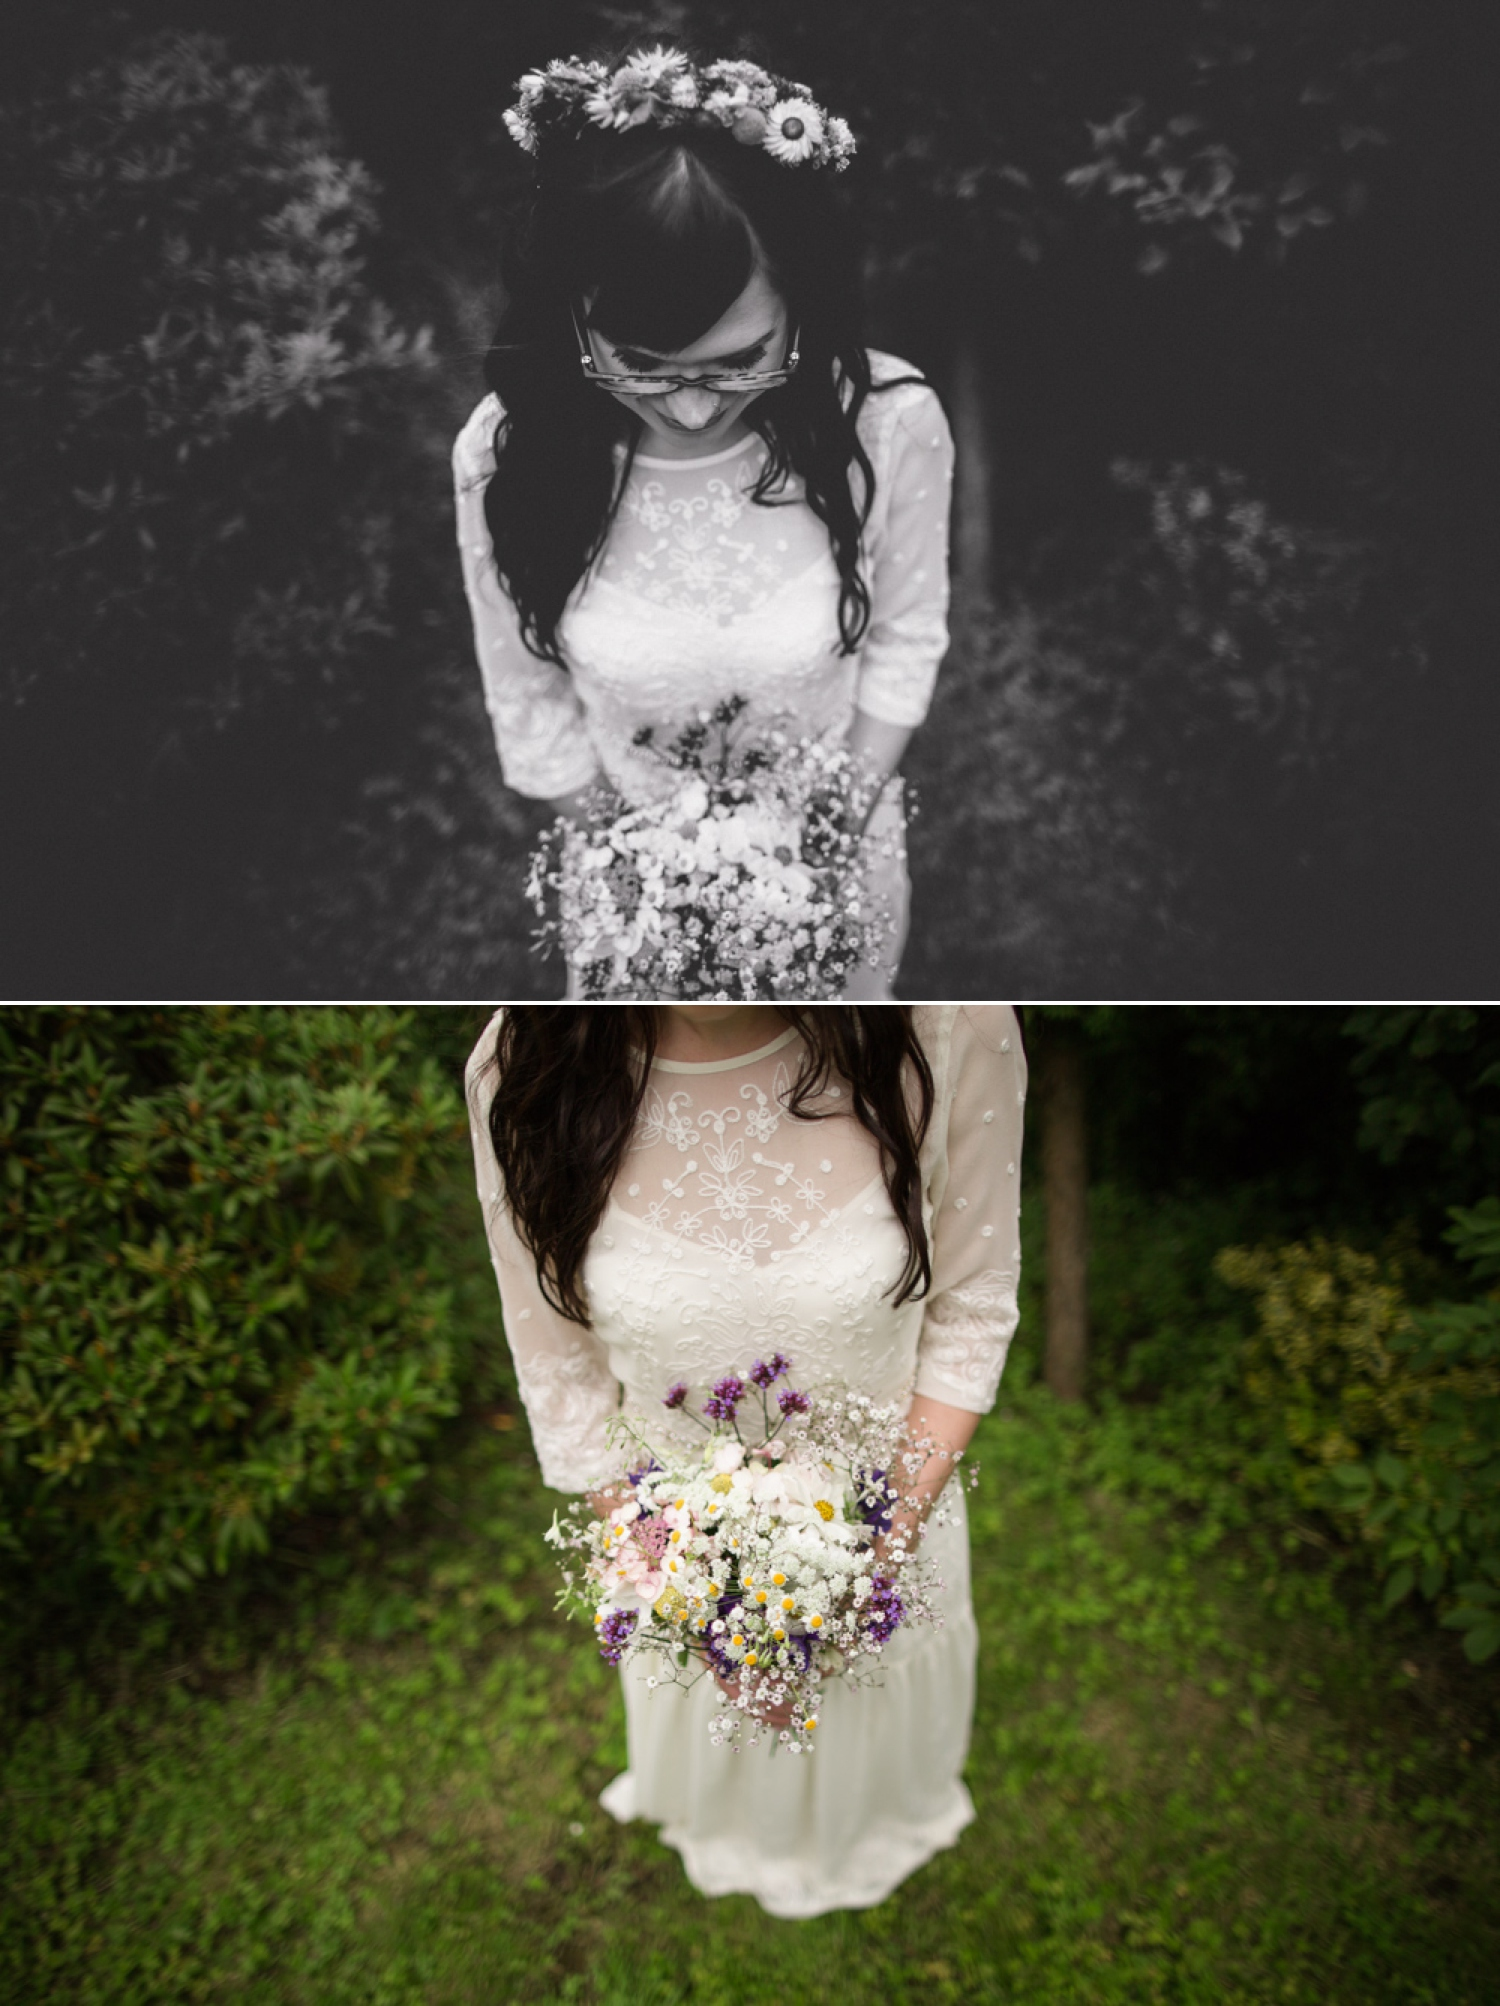 Somerset Wedding Photographer Elly & Liam 14